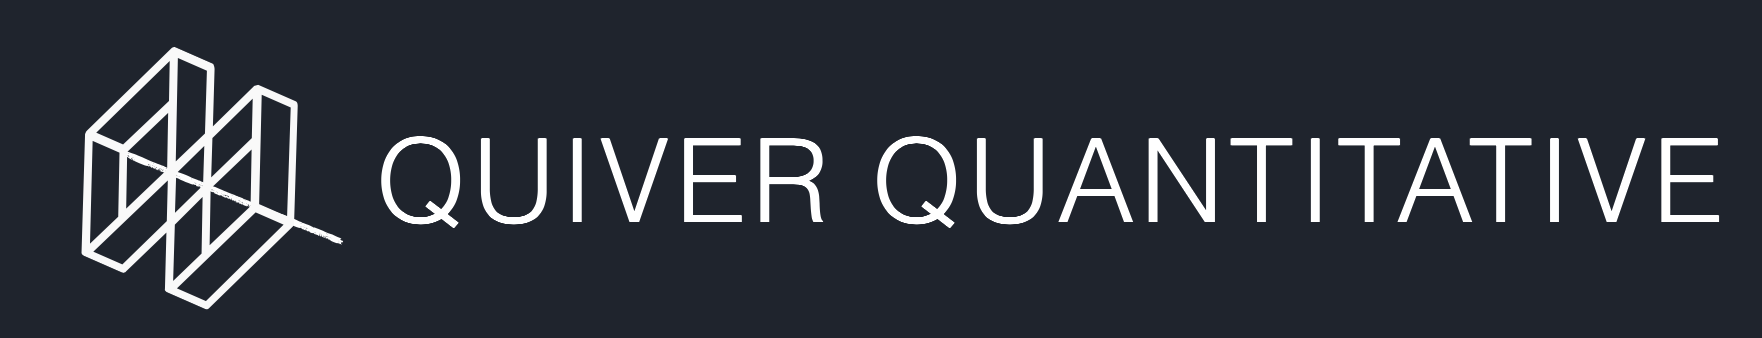 quiver quantitative quiver quantitative